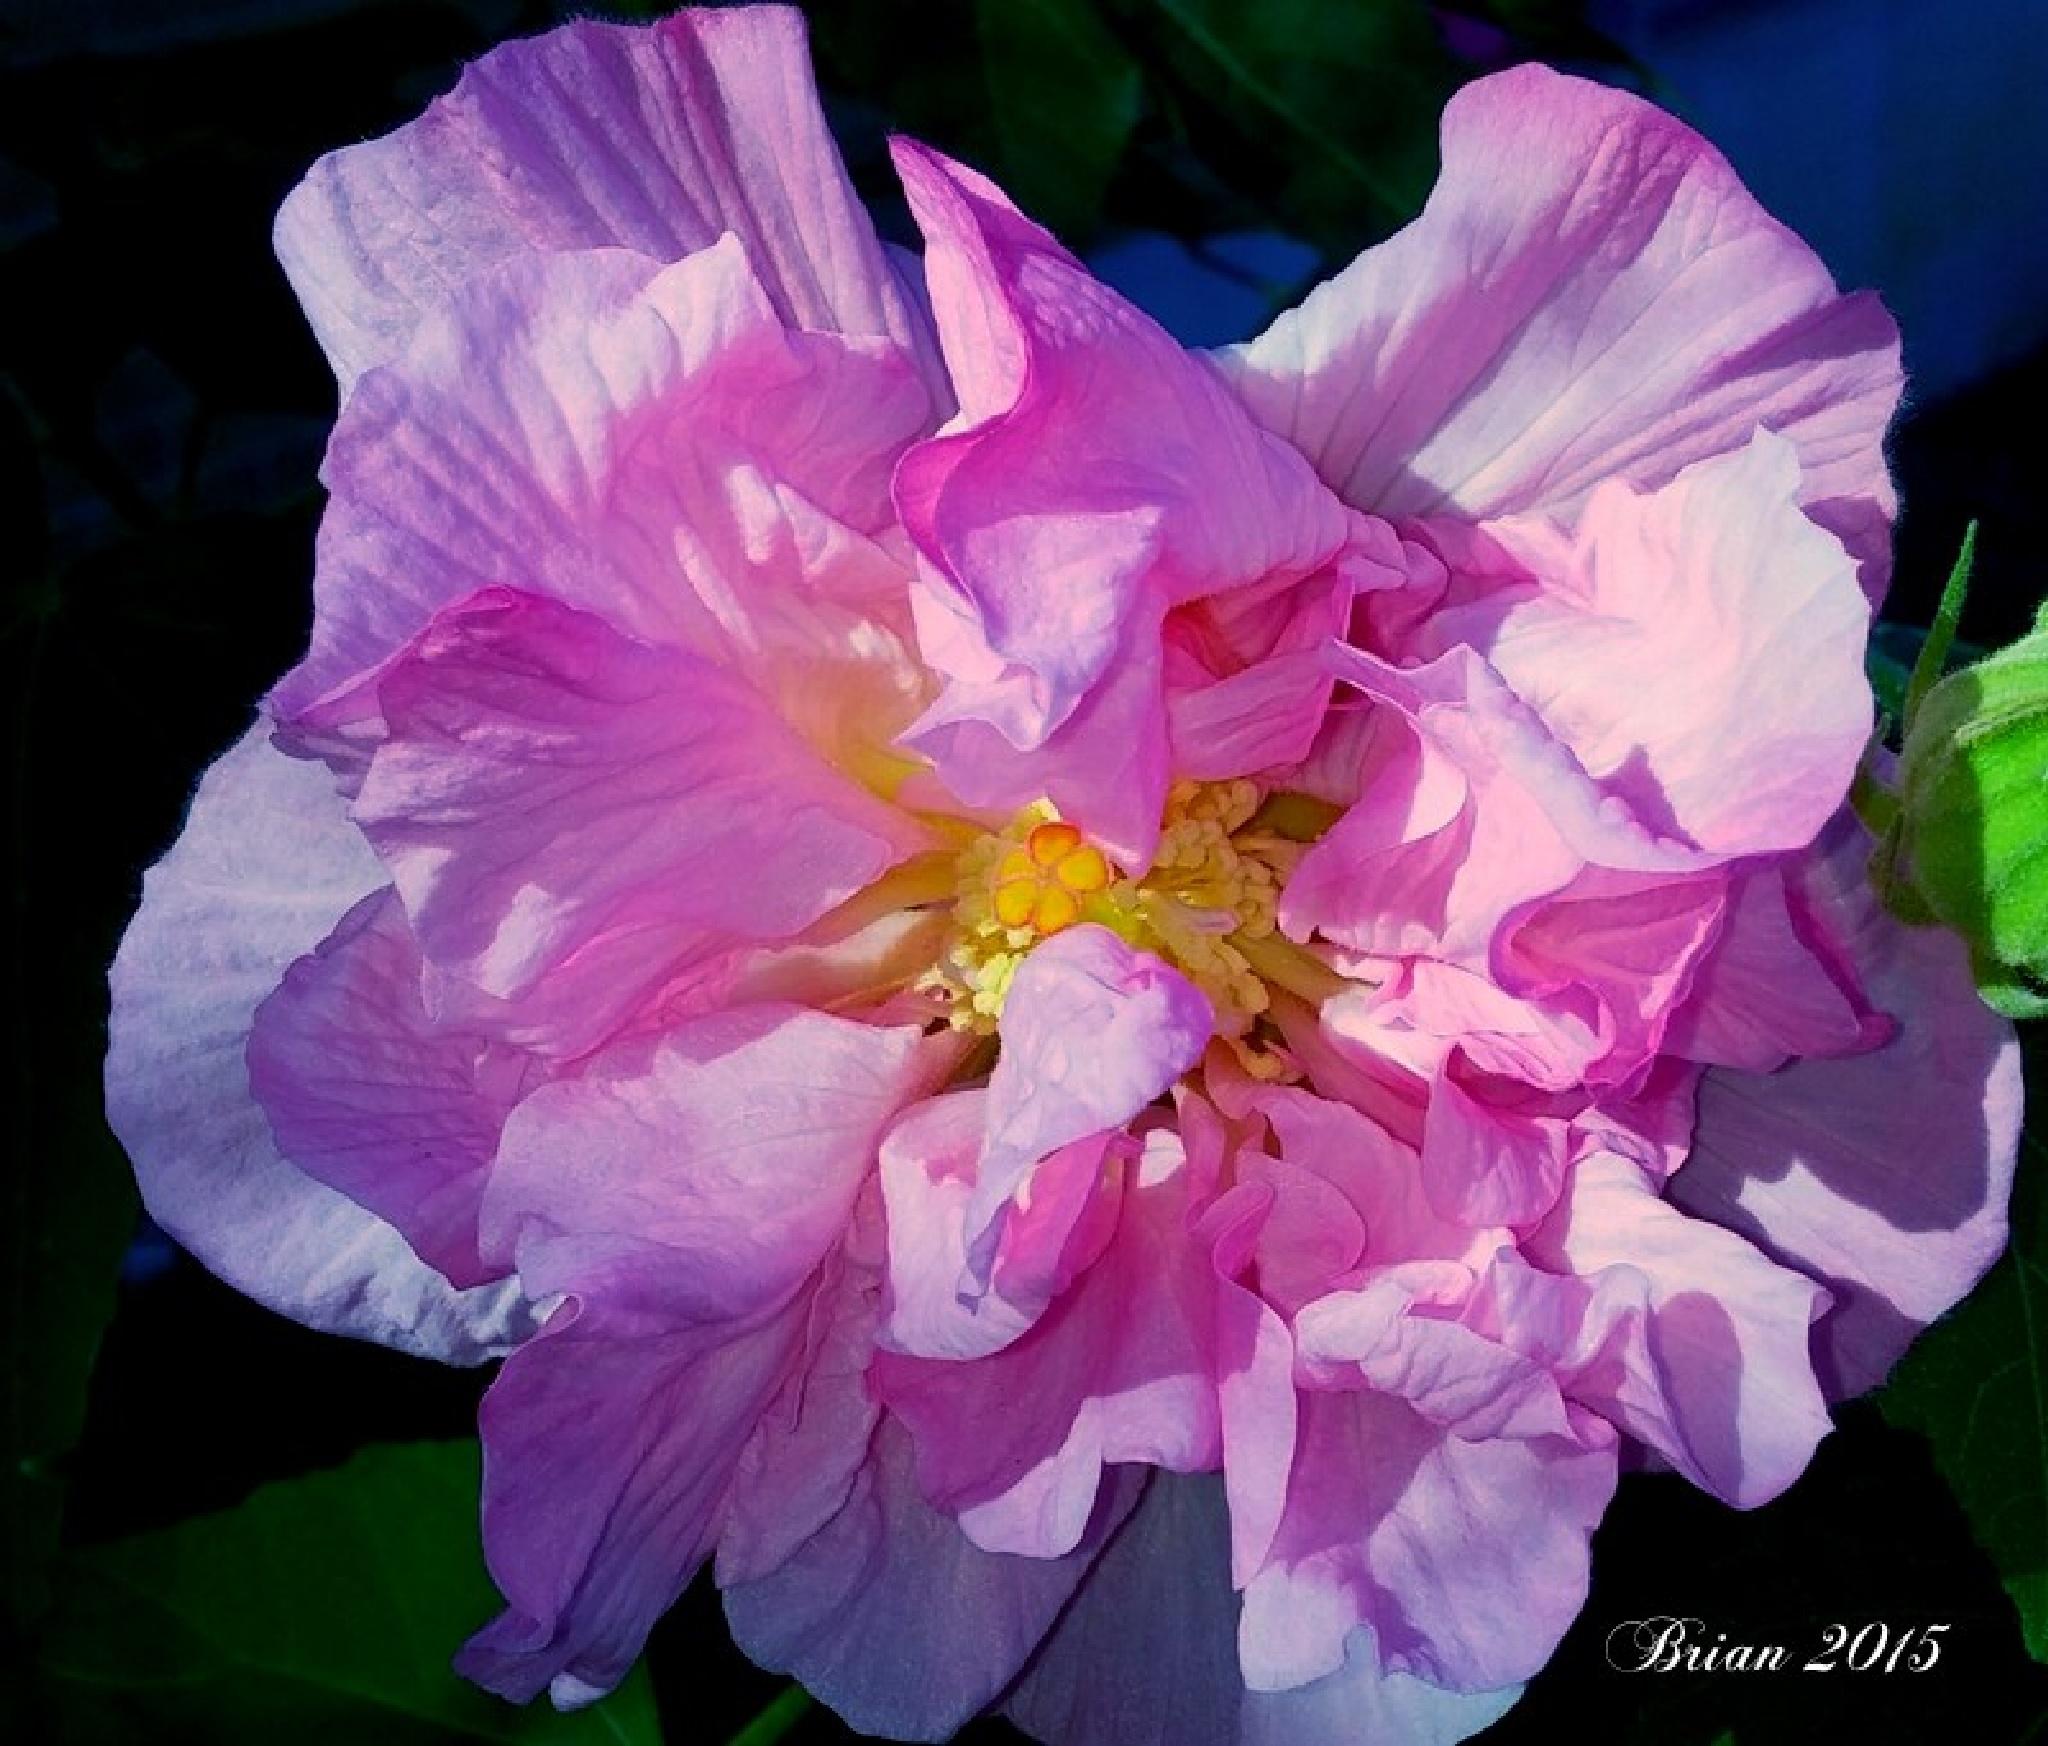 Confederate Rose (Hibiscus mutabilis) by Brian